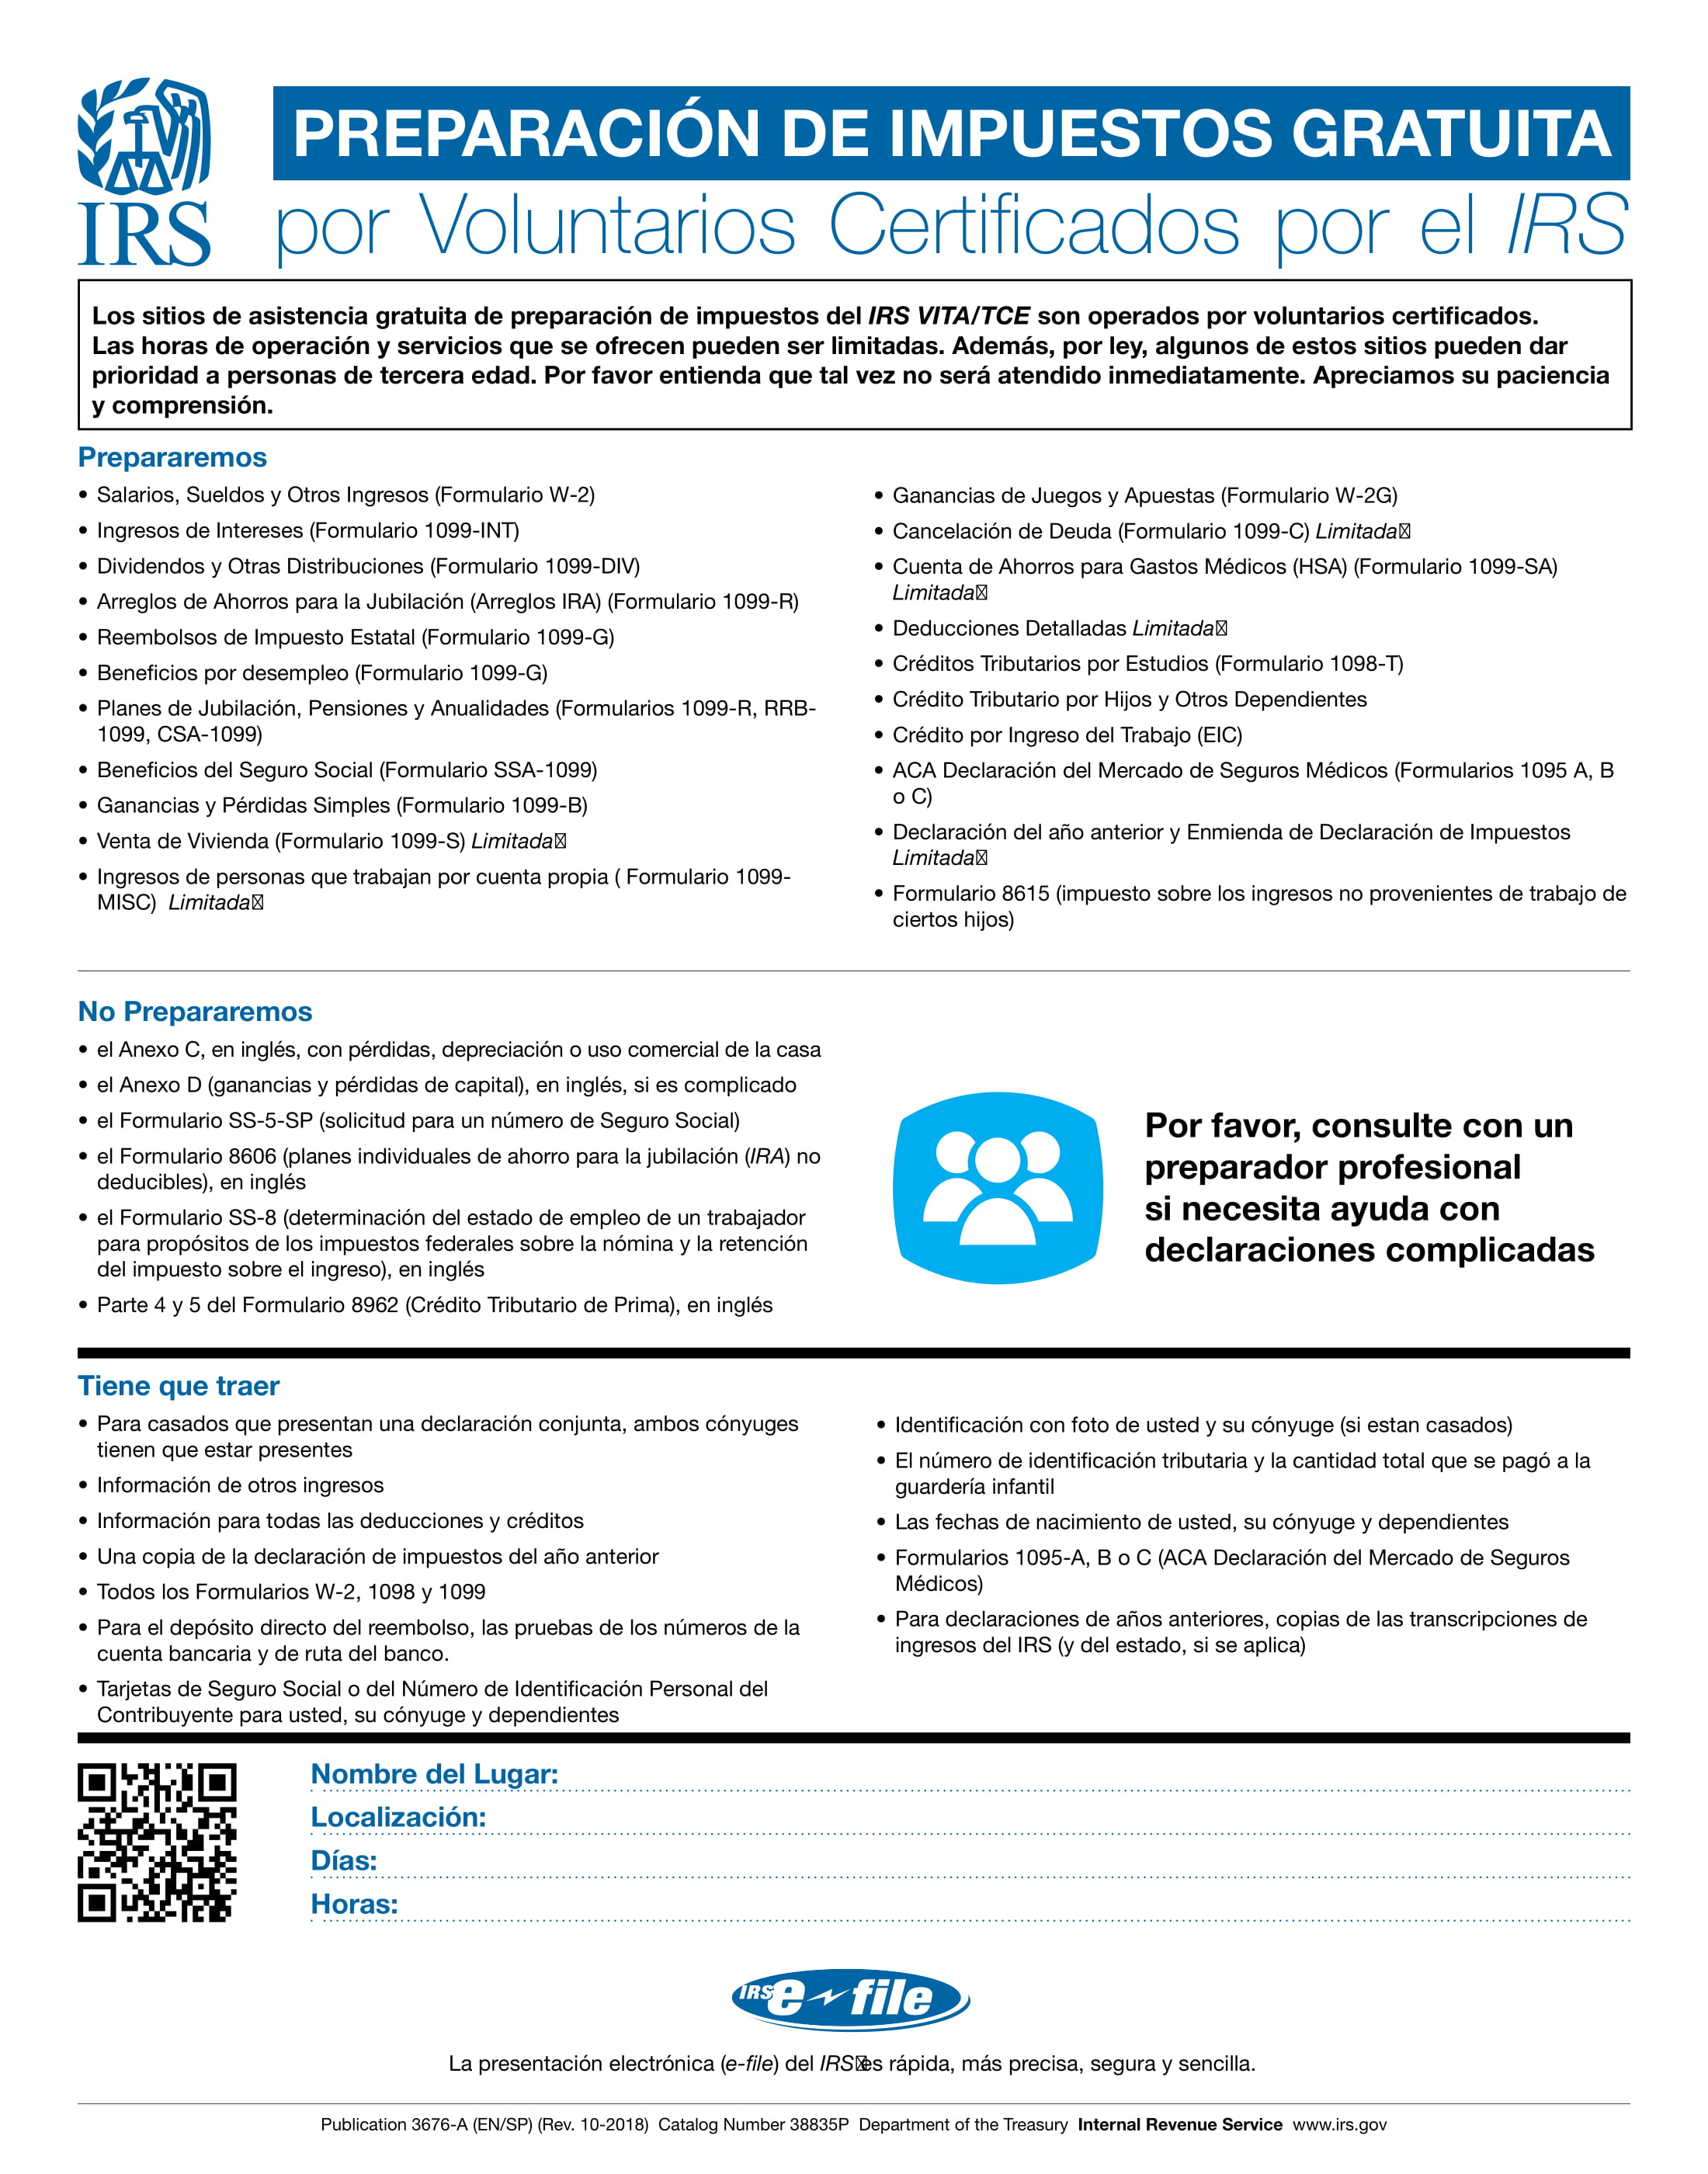 Scope of Services VITA IRS-2.jpg